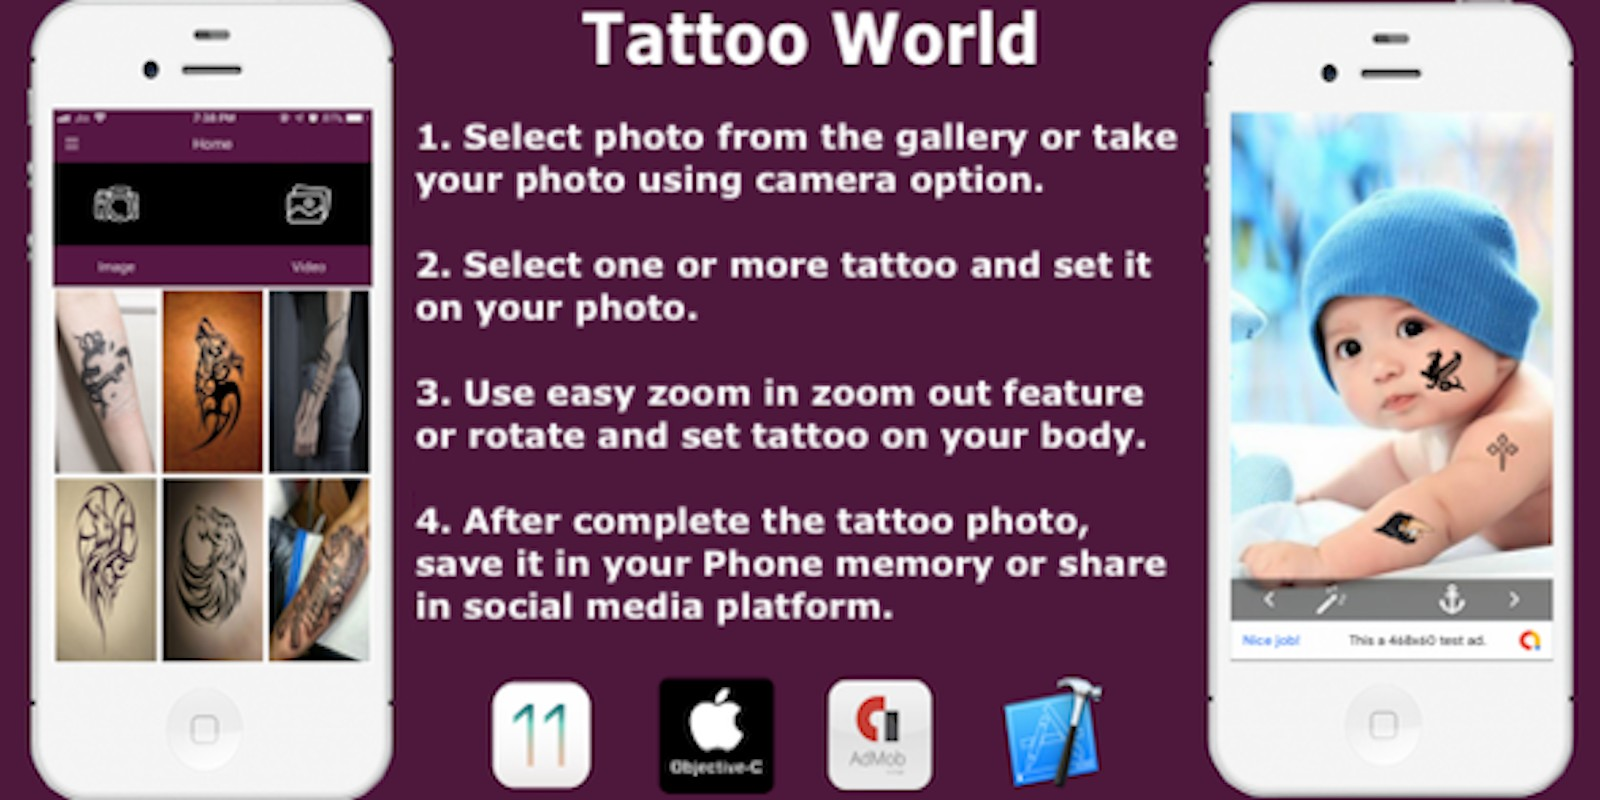 Tattoo World - iOS Source Code